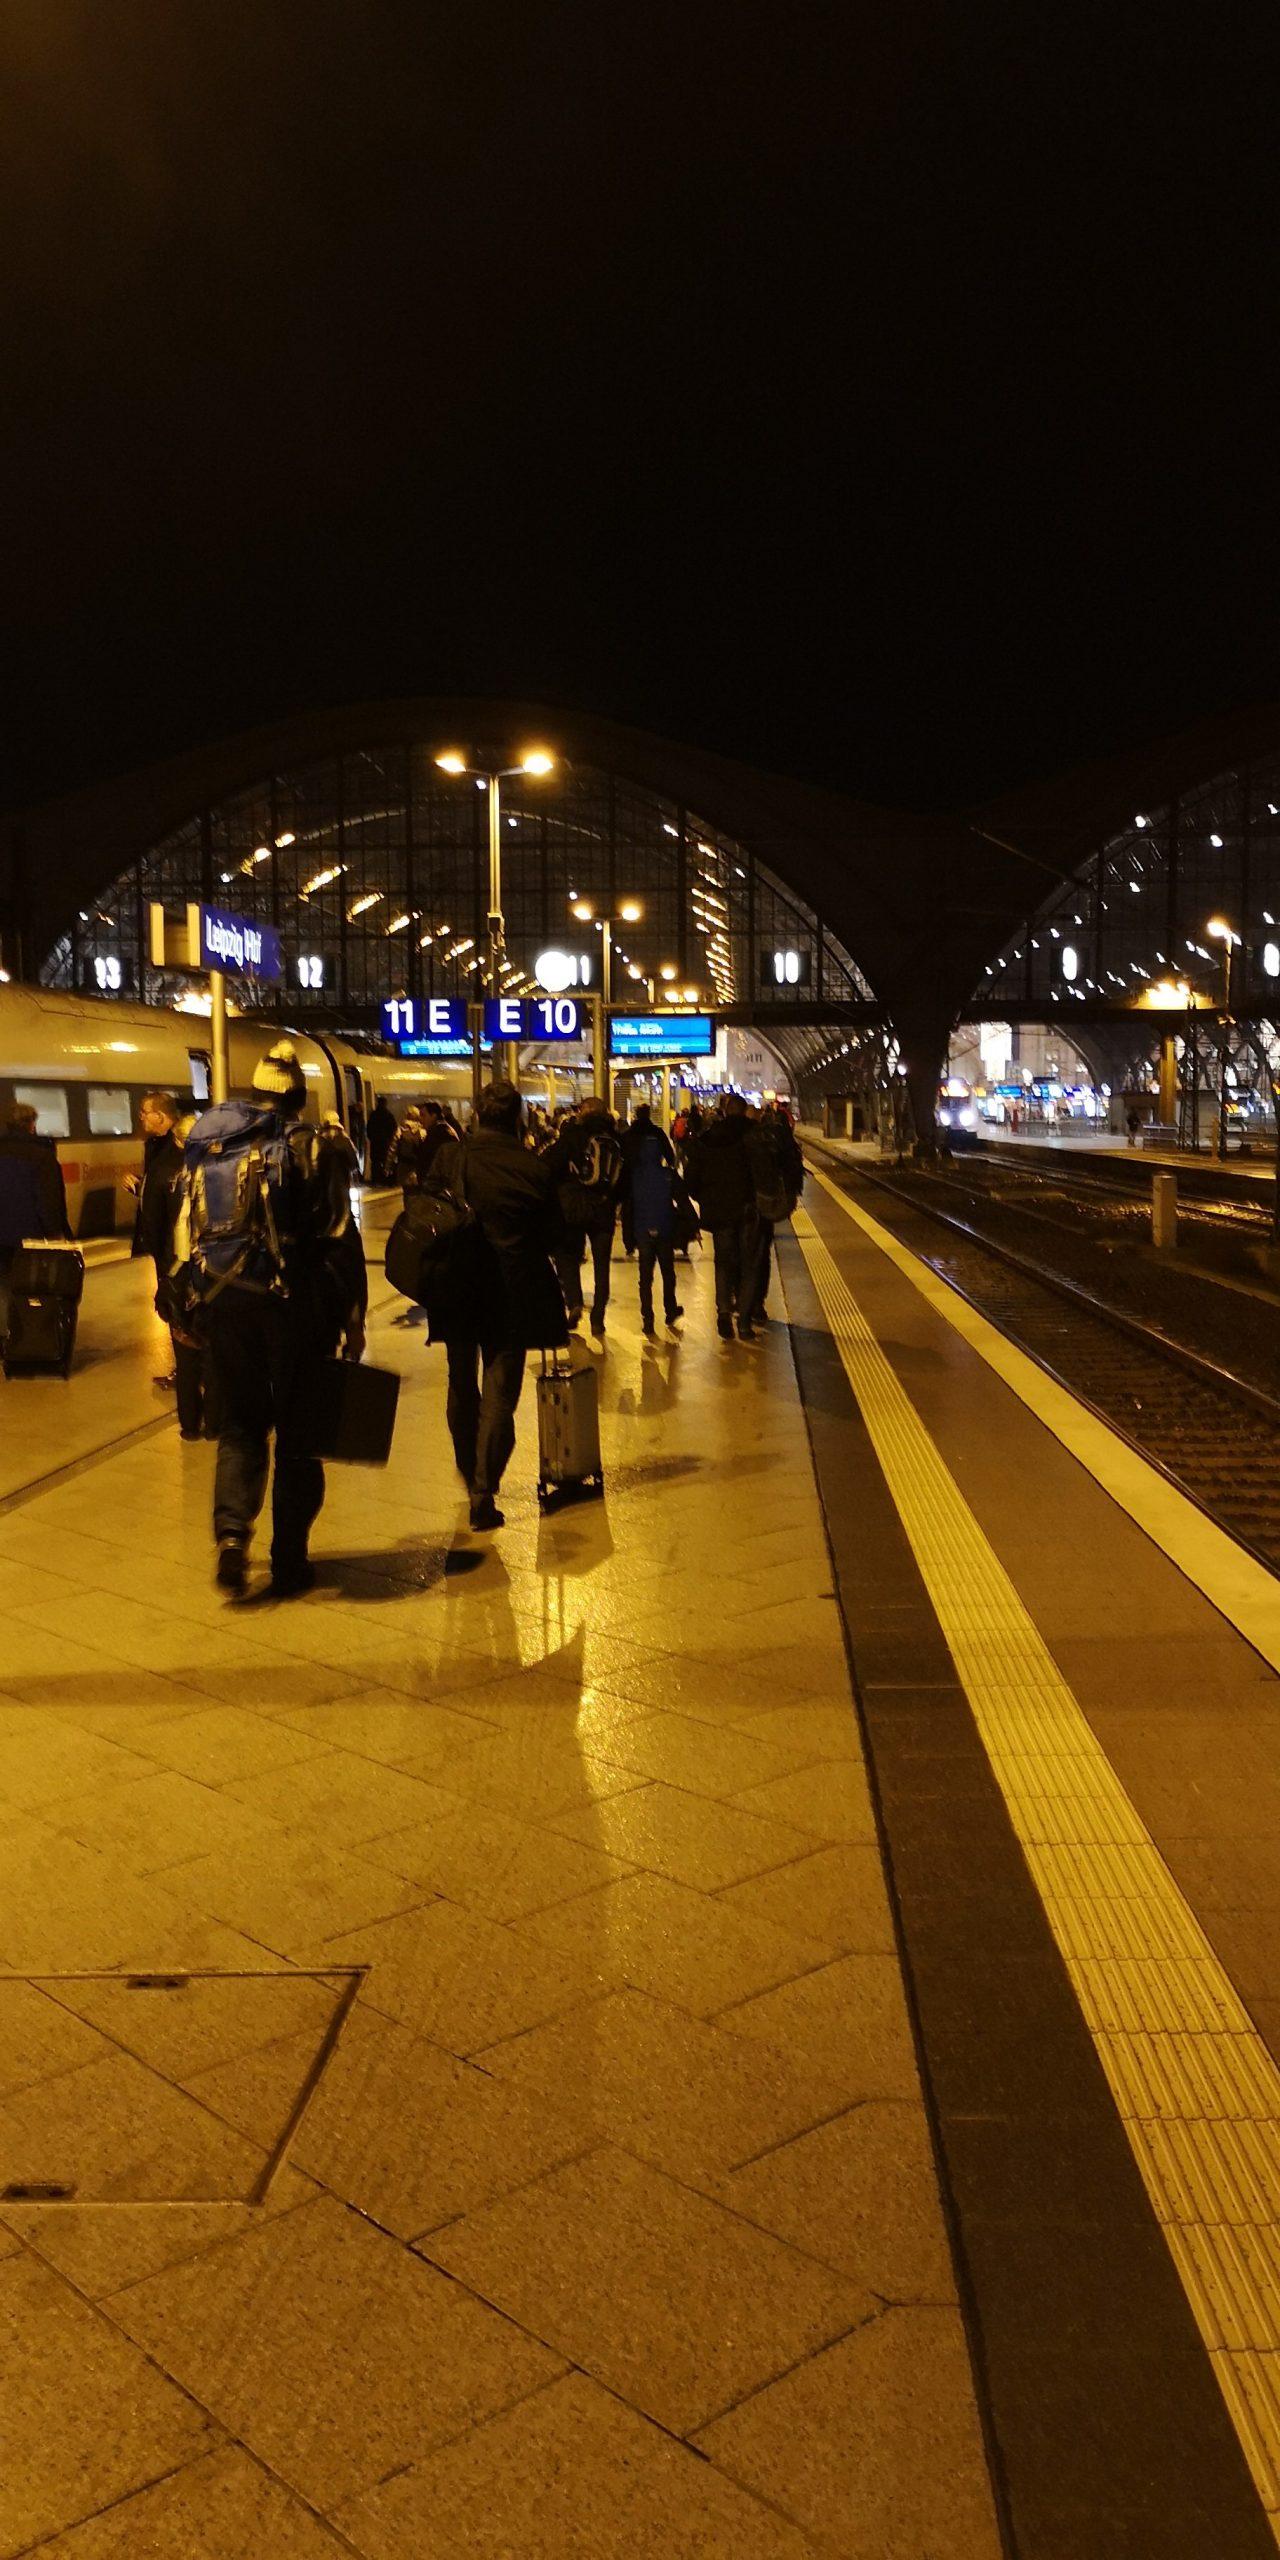 Morgens in der S-Bahn